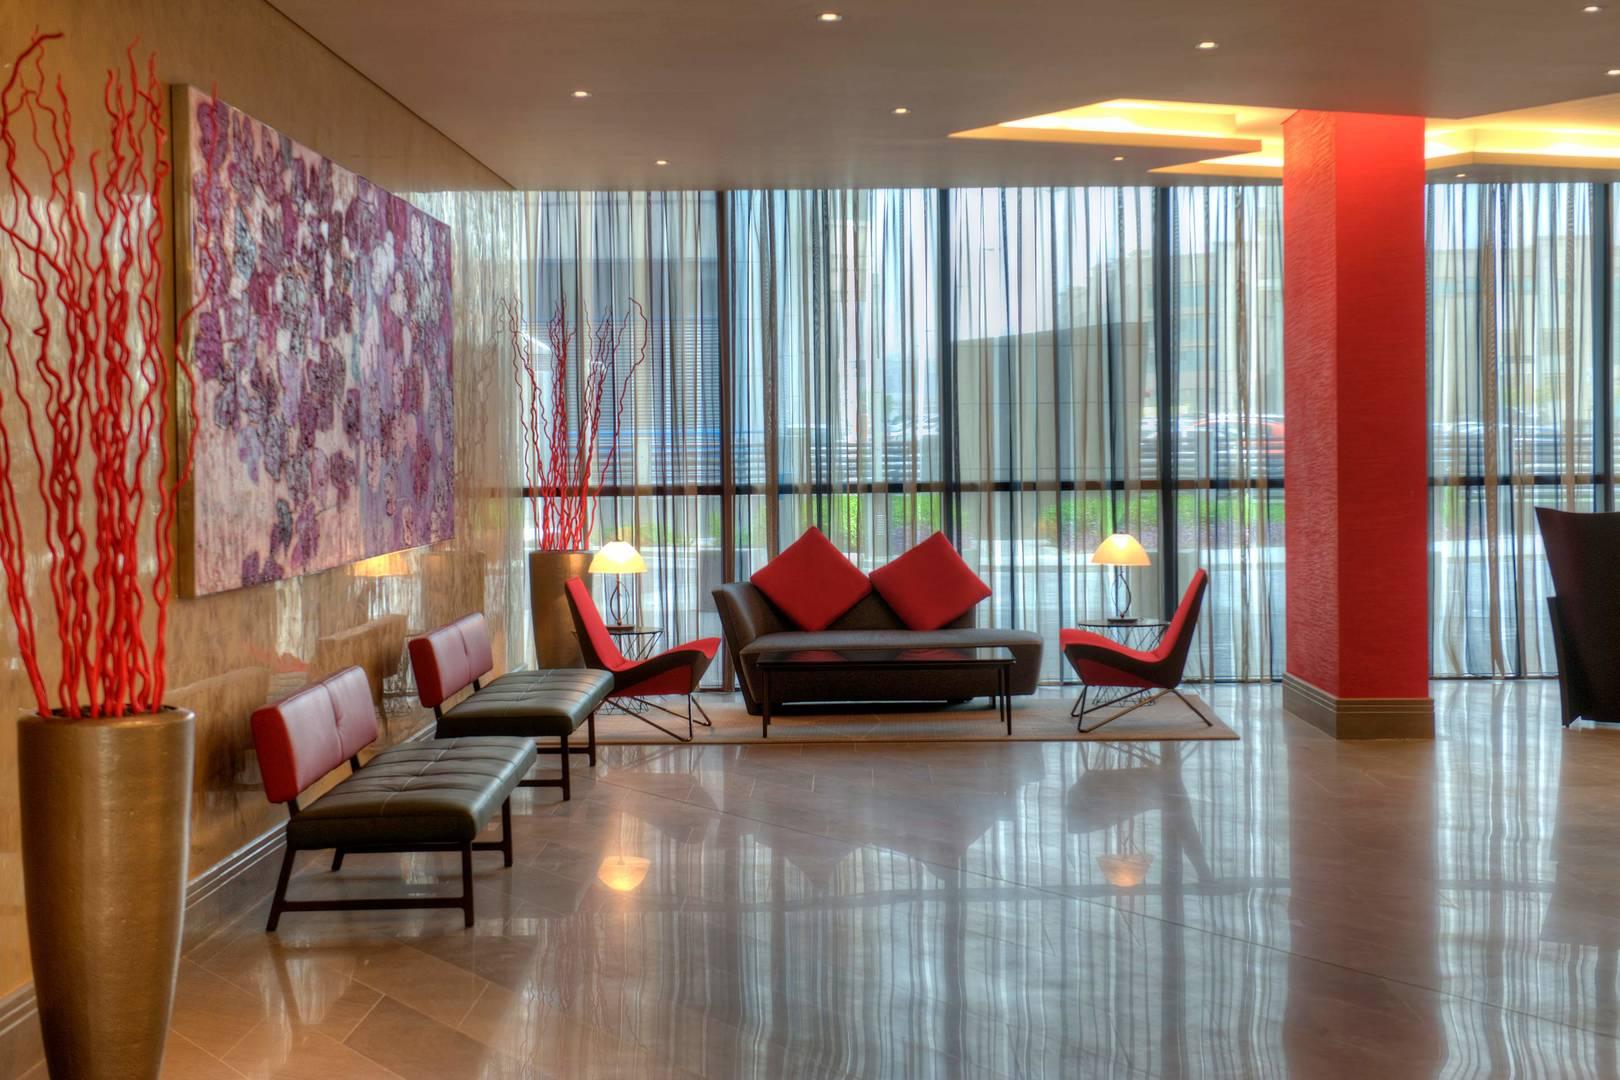 https://cdn.jumeirah.com/-/mediadh/DH/Hospitality/Jumeirah/Occasion/Dubai/Creekside-Hotel/JumeirahCreeksideHotelAtelier265.jpg?h=1080&w=1620&hash=96713EC611C9F778B55B7C7B19282F38